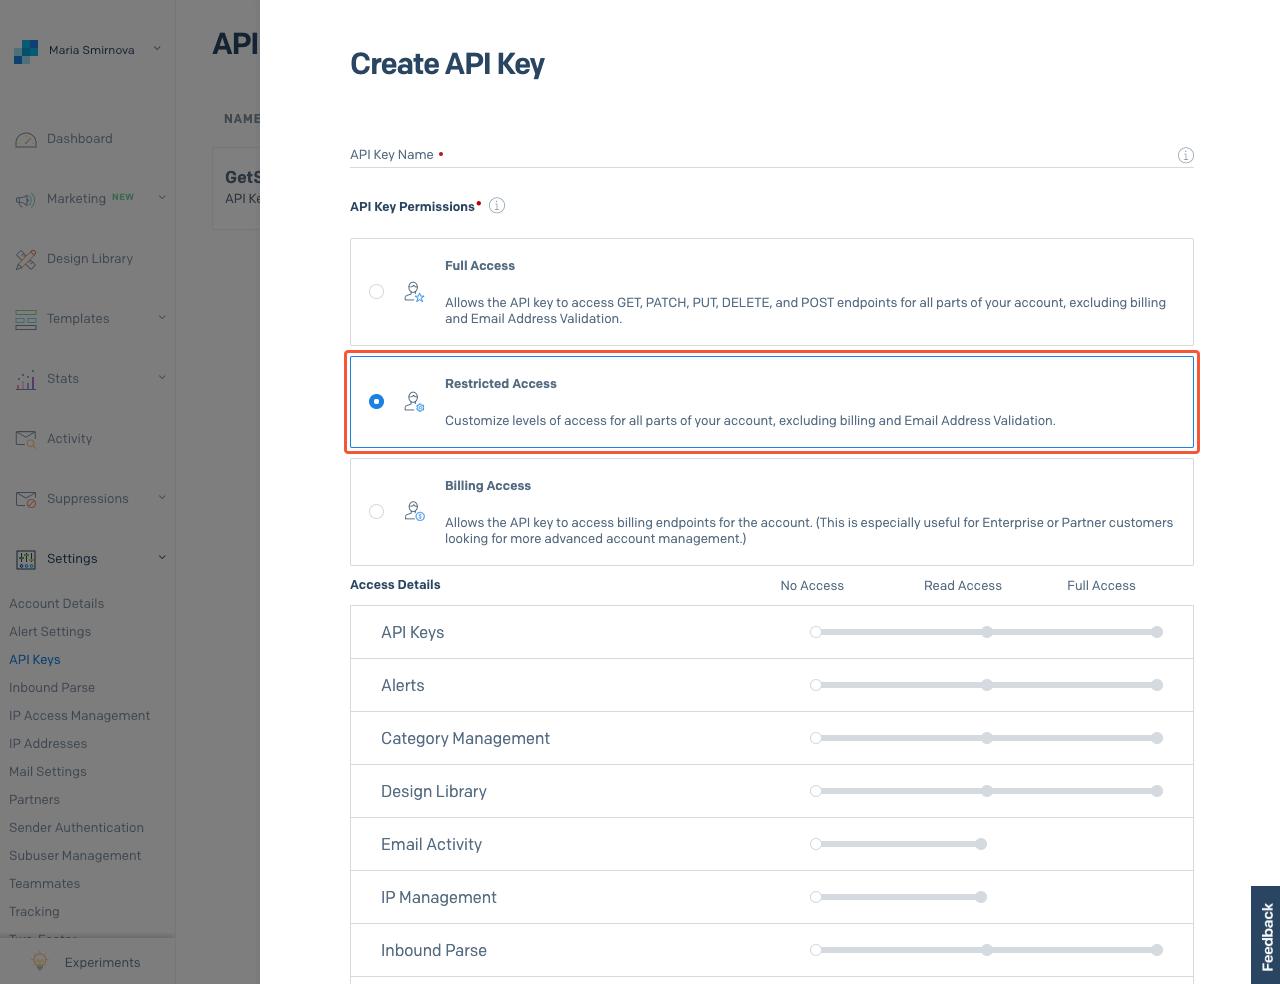 SendGrid API key settings section